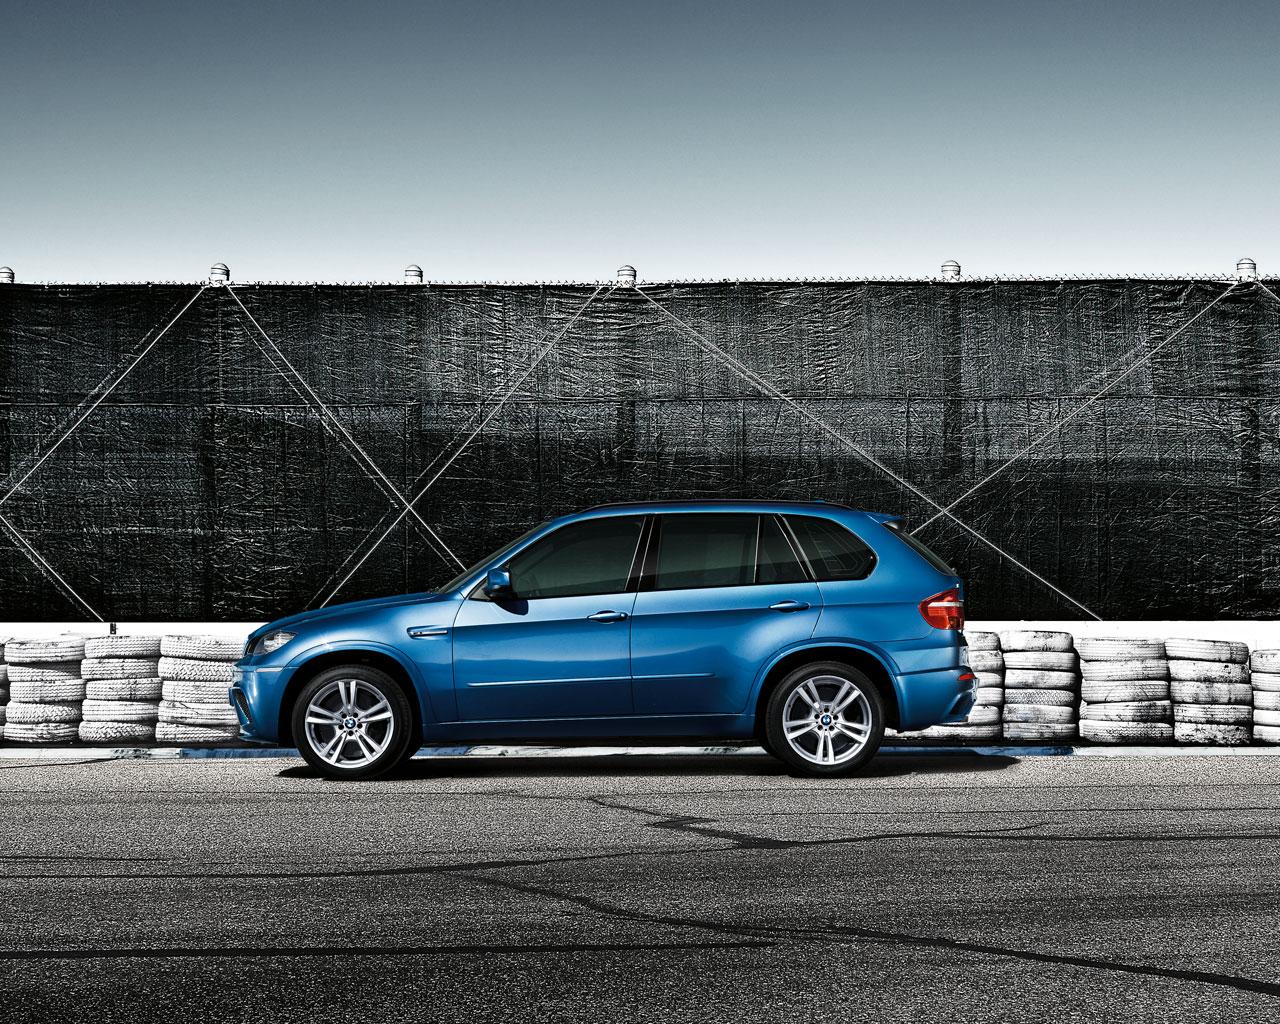 All Car Wallpaper Bmw X6m Wallpaper